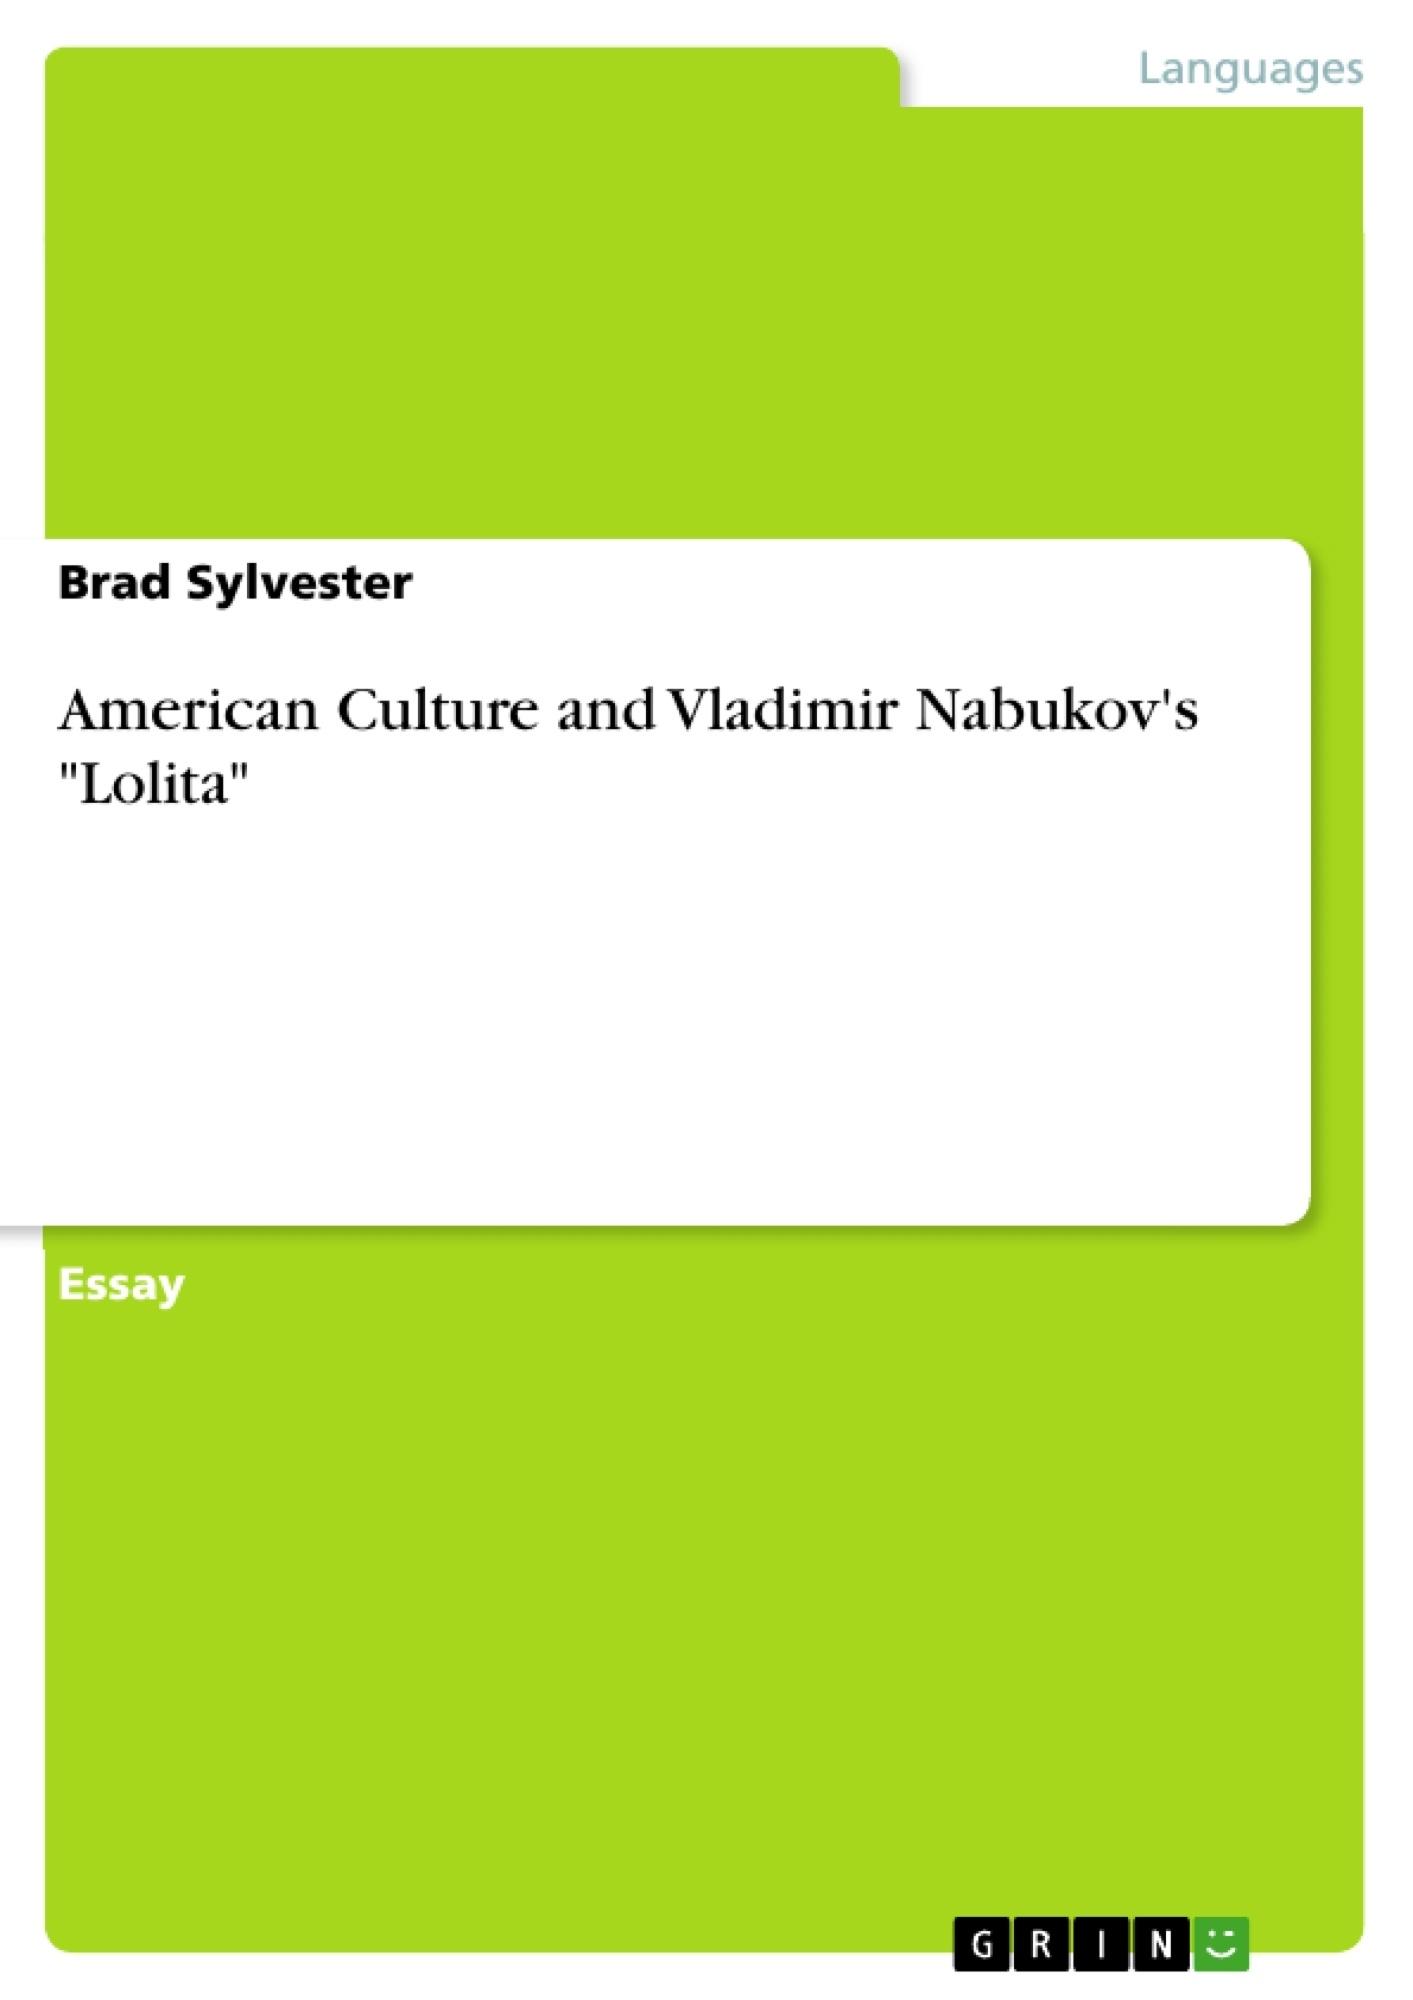 "Title: American Culture and Vladimir Nabukov's ""Lolita"""